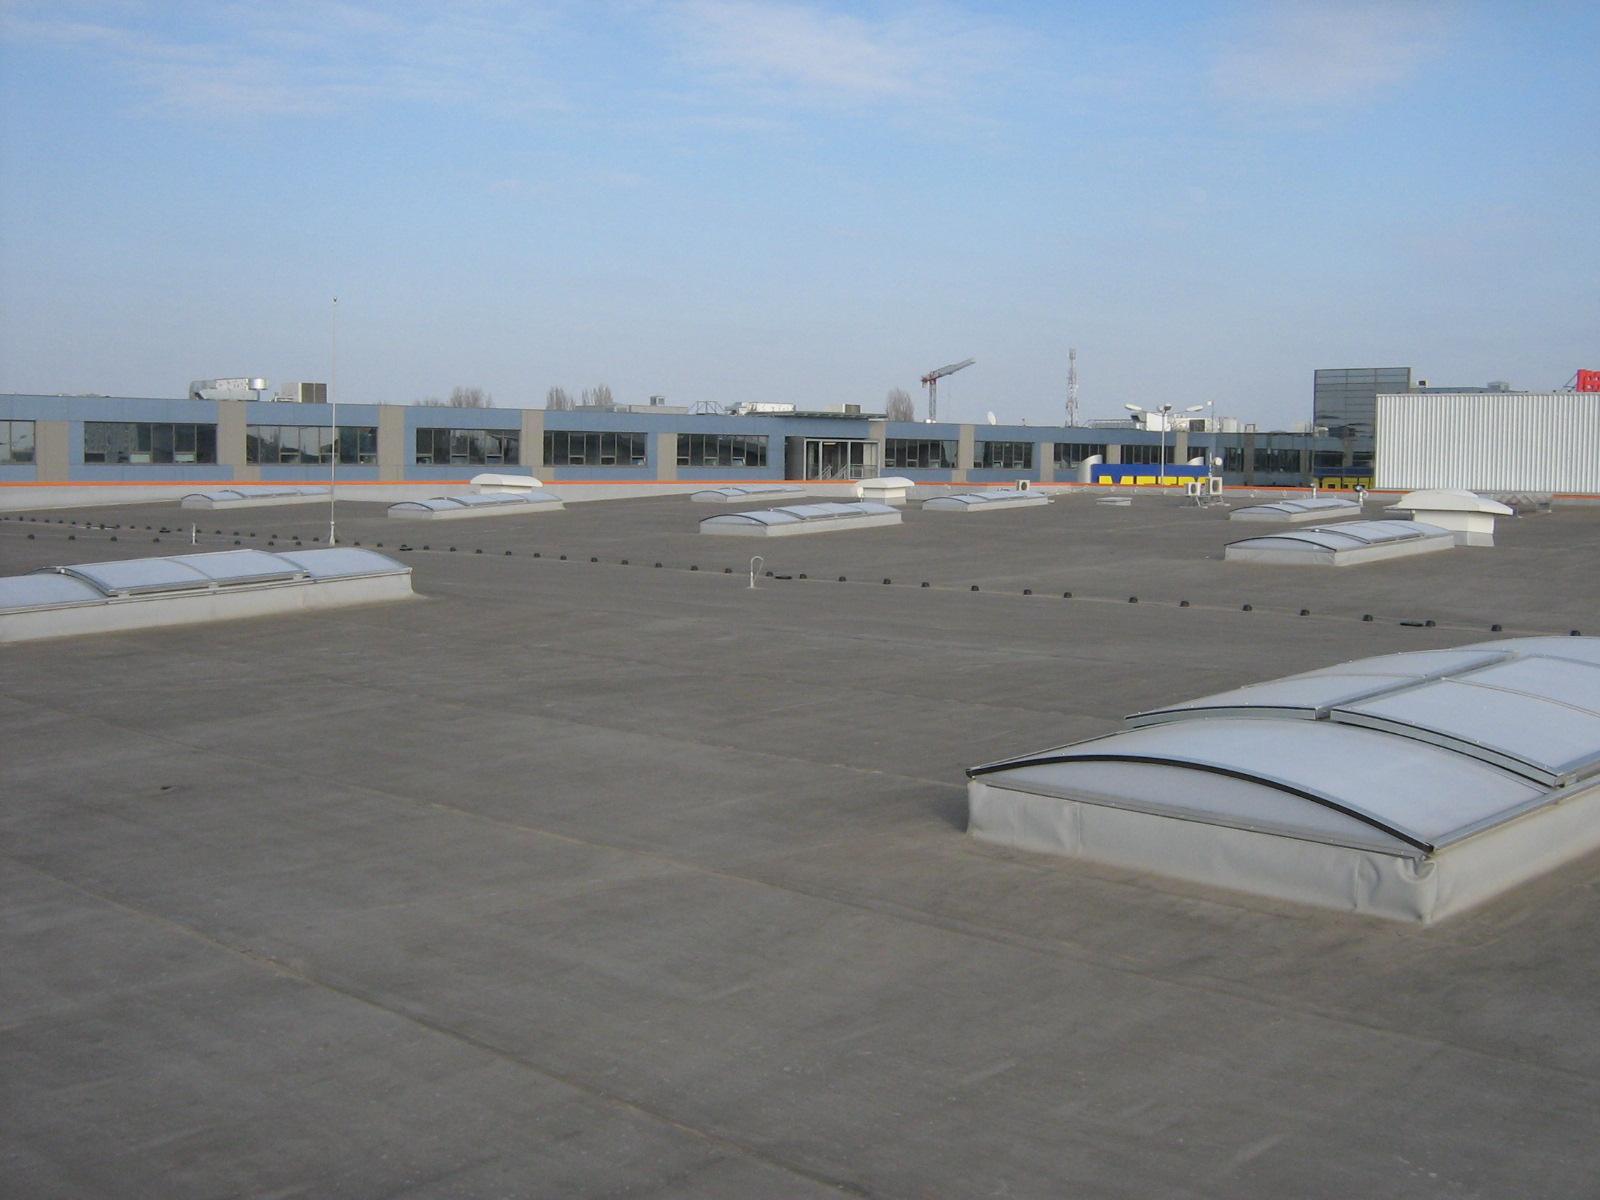 Luminatoare industriale - Spatiu comercial OBI - Policolor HEXADOME - Poza 4